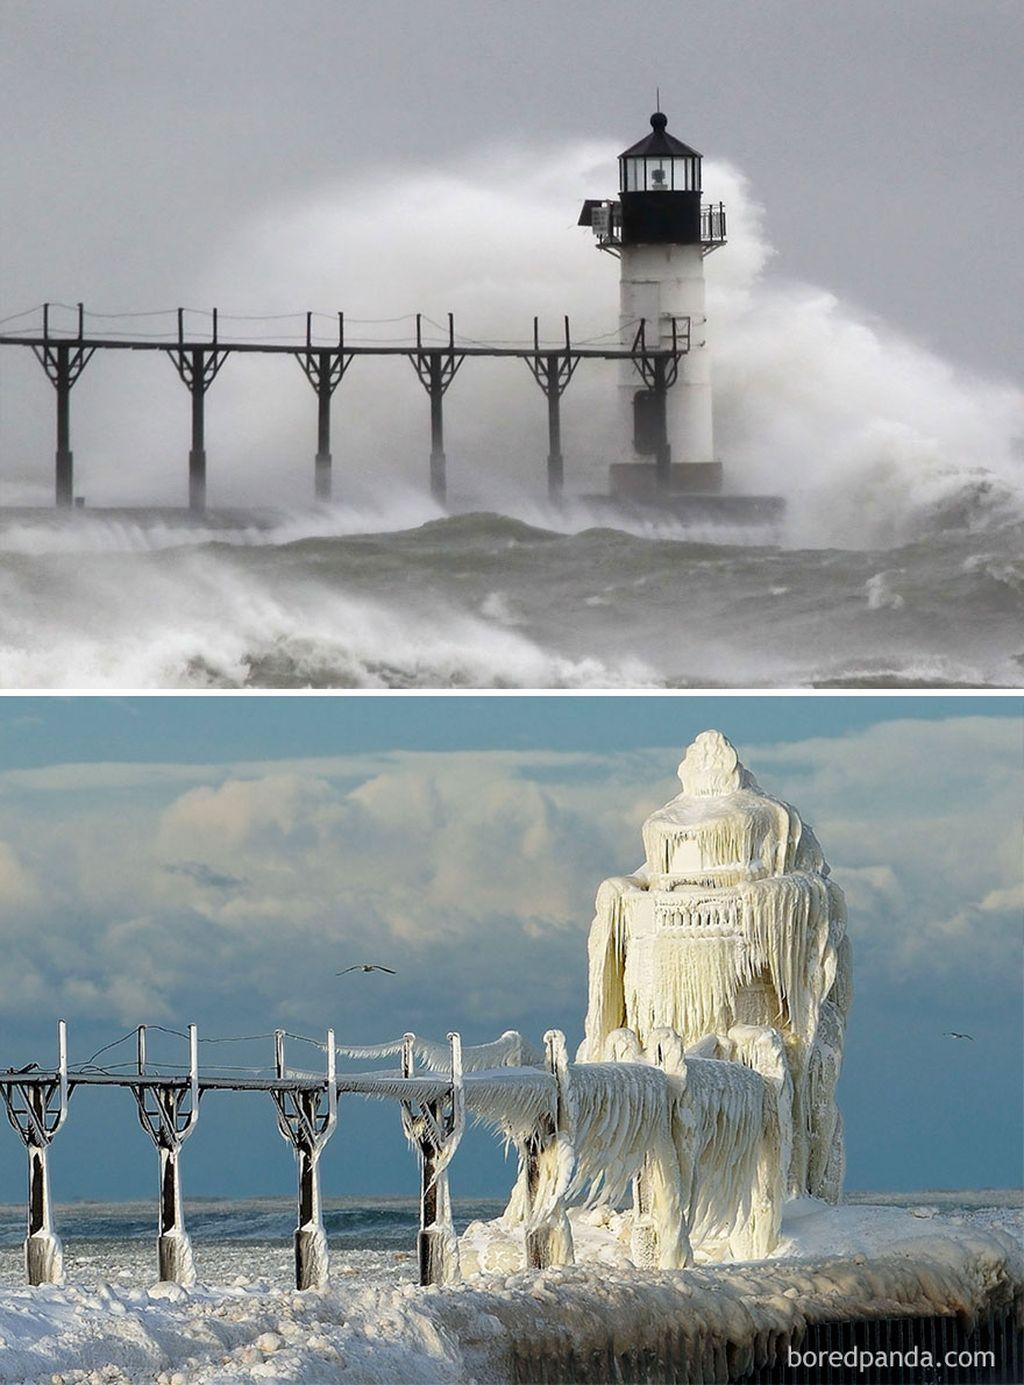 Foto mercusuar di Michigan, Amerika serikat yang dihantam ombak air. Namunsaat musim salju, air laut pun ikut menjadi beku. (Foto: Boredpanda)